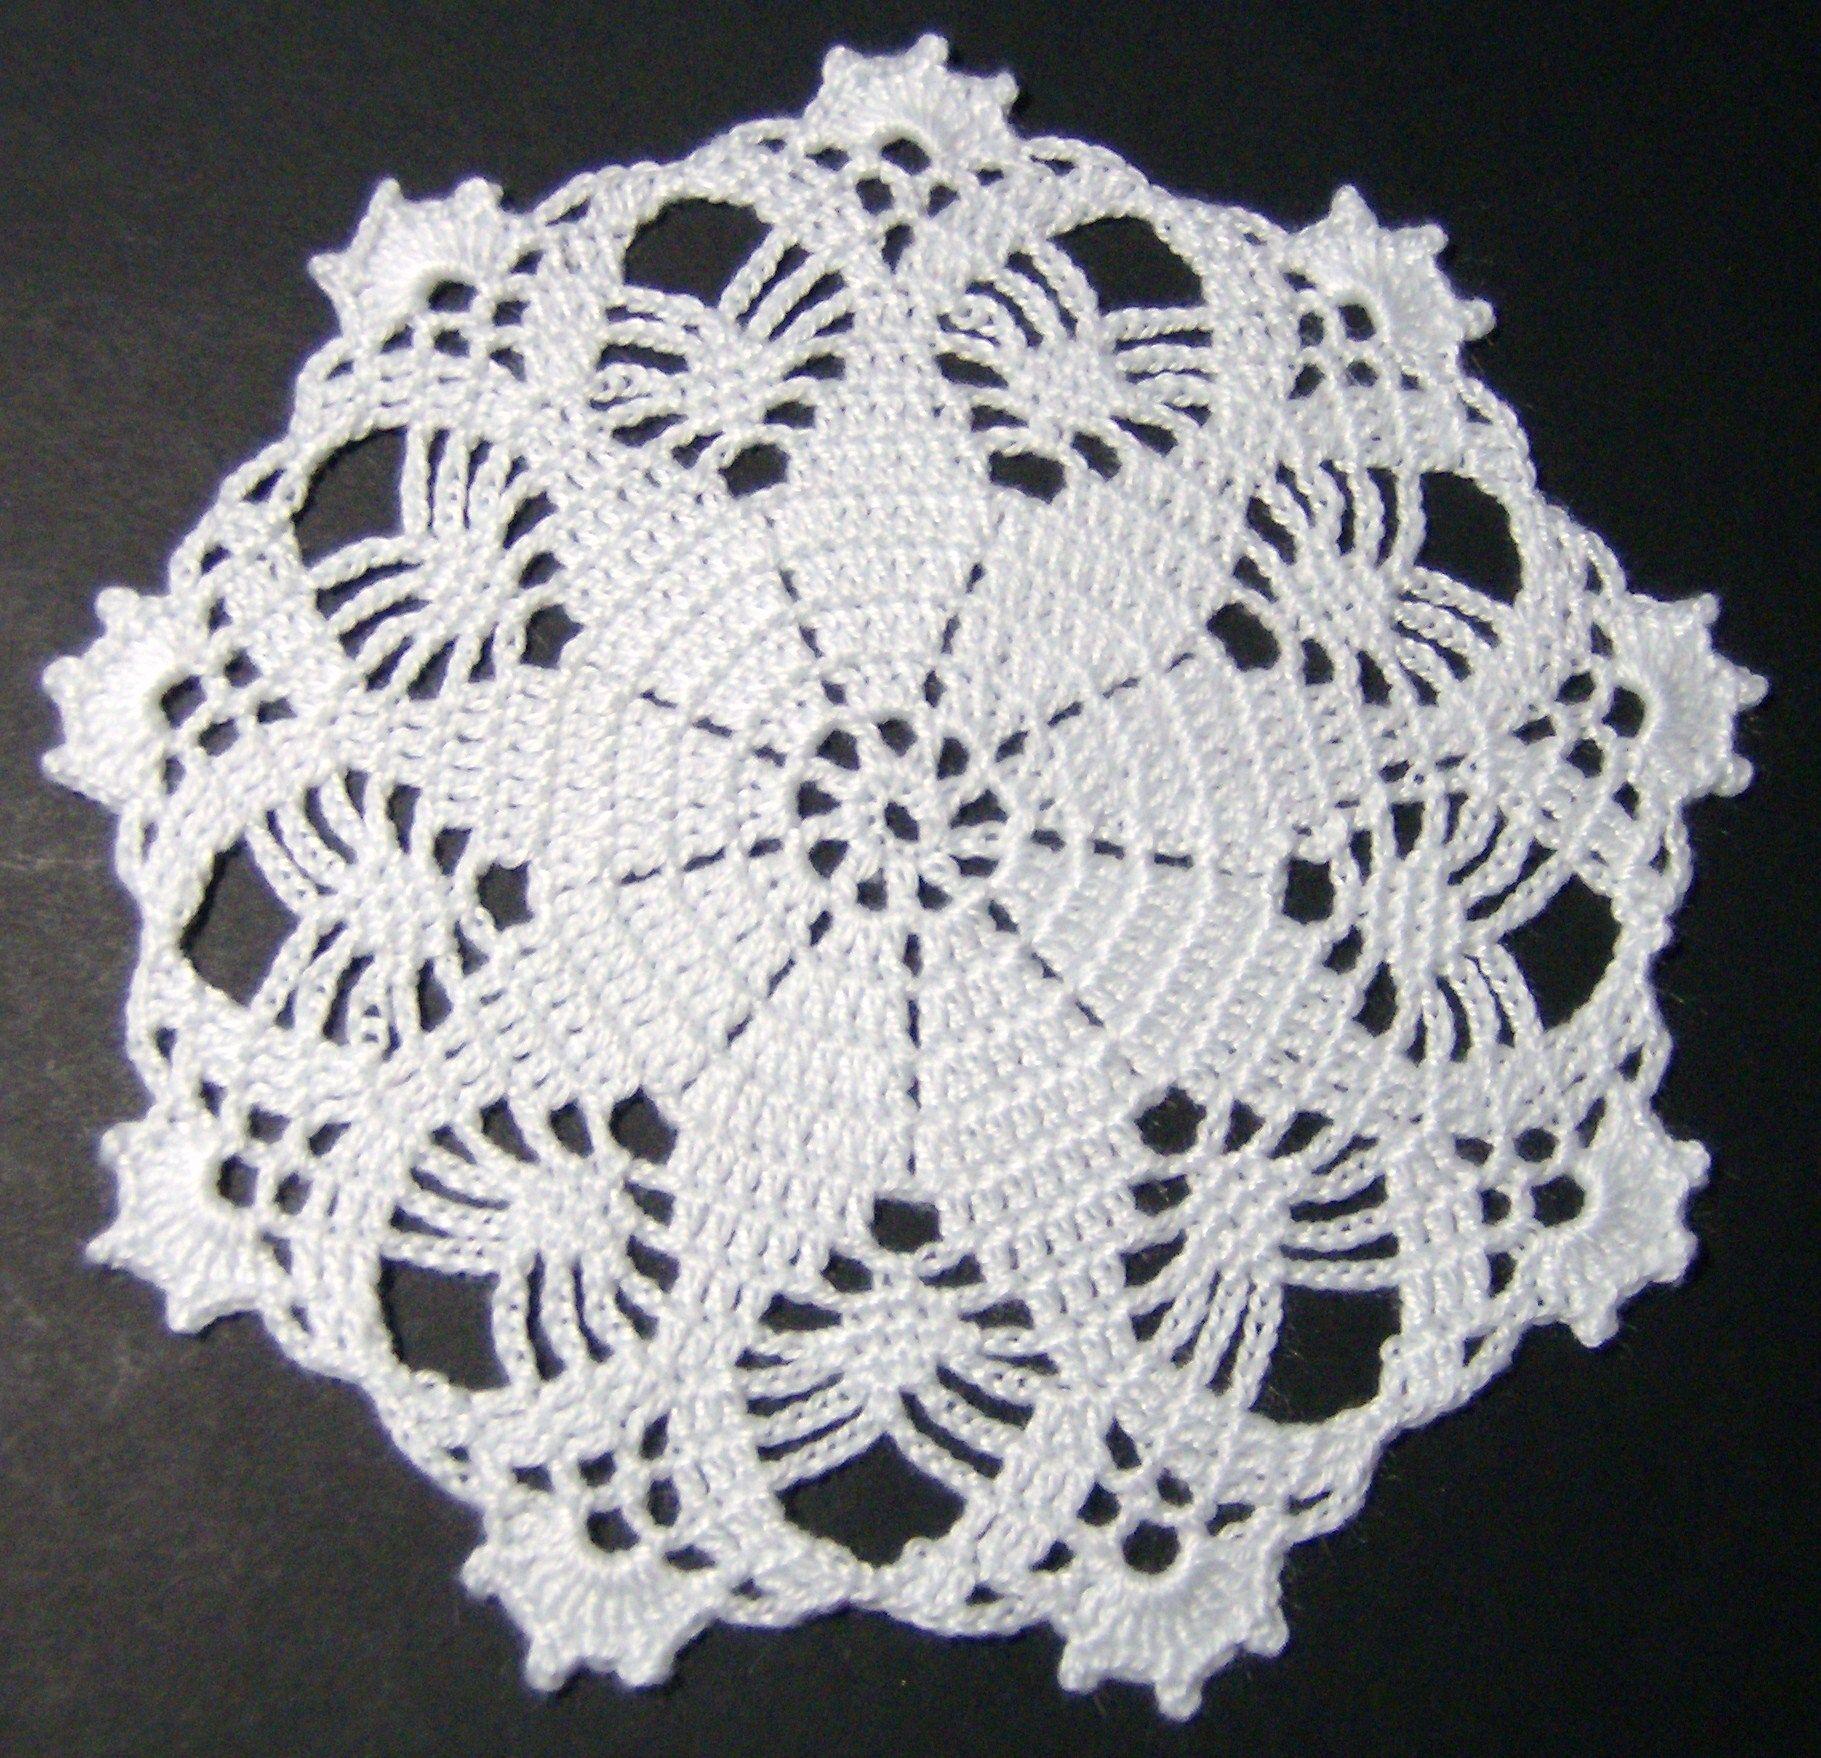 Crochet Doily Handmade   Crochet - Doilies   Pinterest   Ganchillo y ...